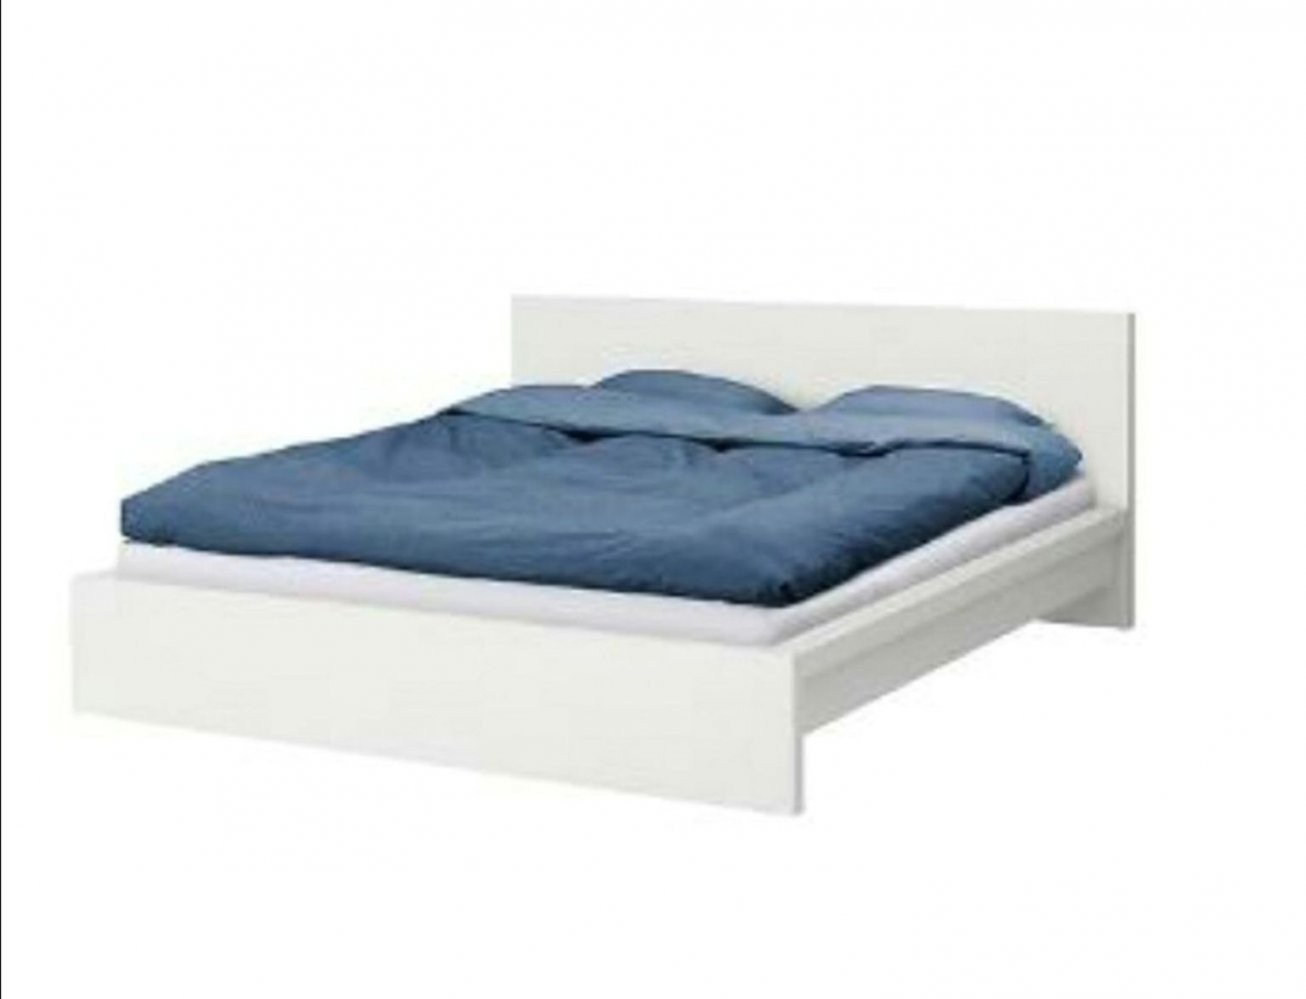 Gebraucht Ikea Malm Bett 140X200 Weiß In 68623 Lampertheim Um von Ikea Malm Bett 140X200 Weiß Photo